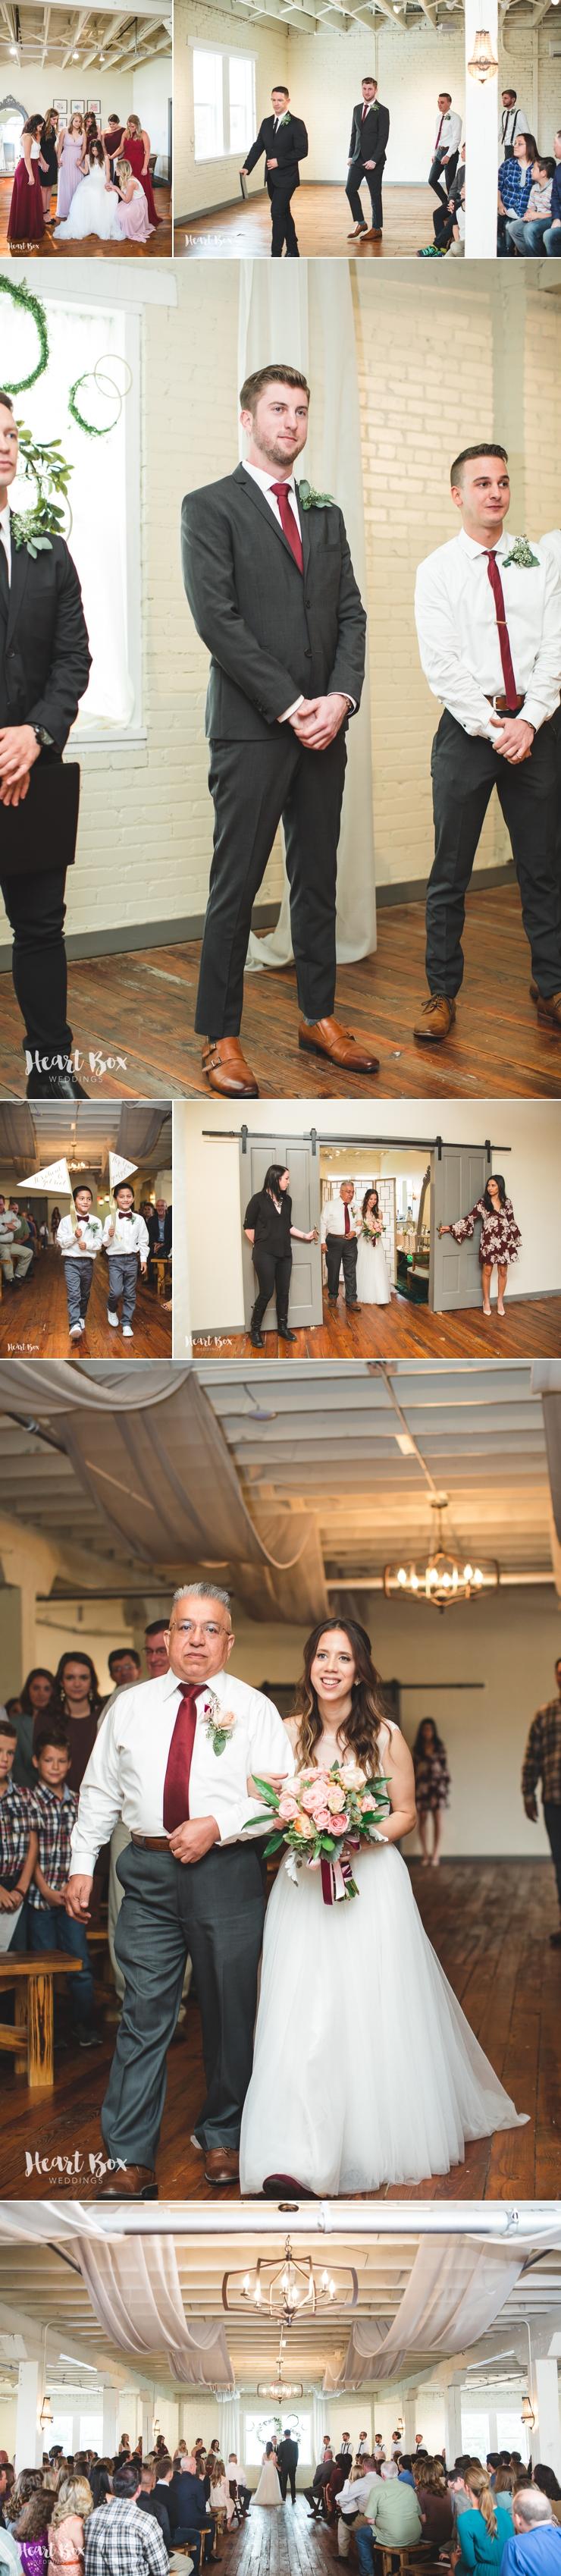 Hicks Wedding 16.jpg